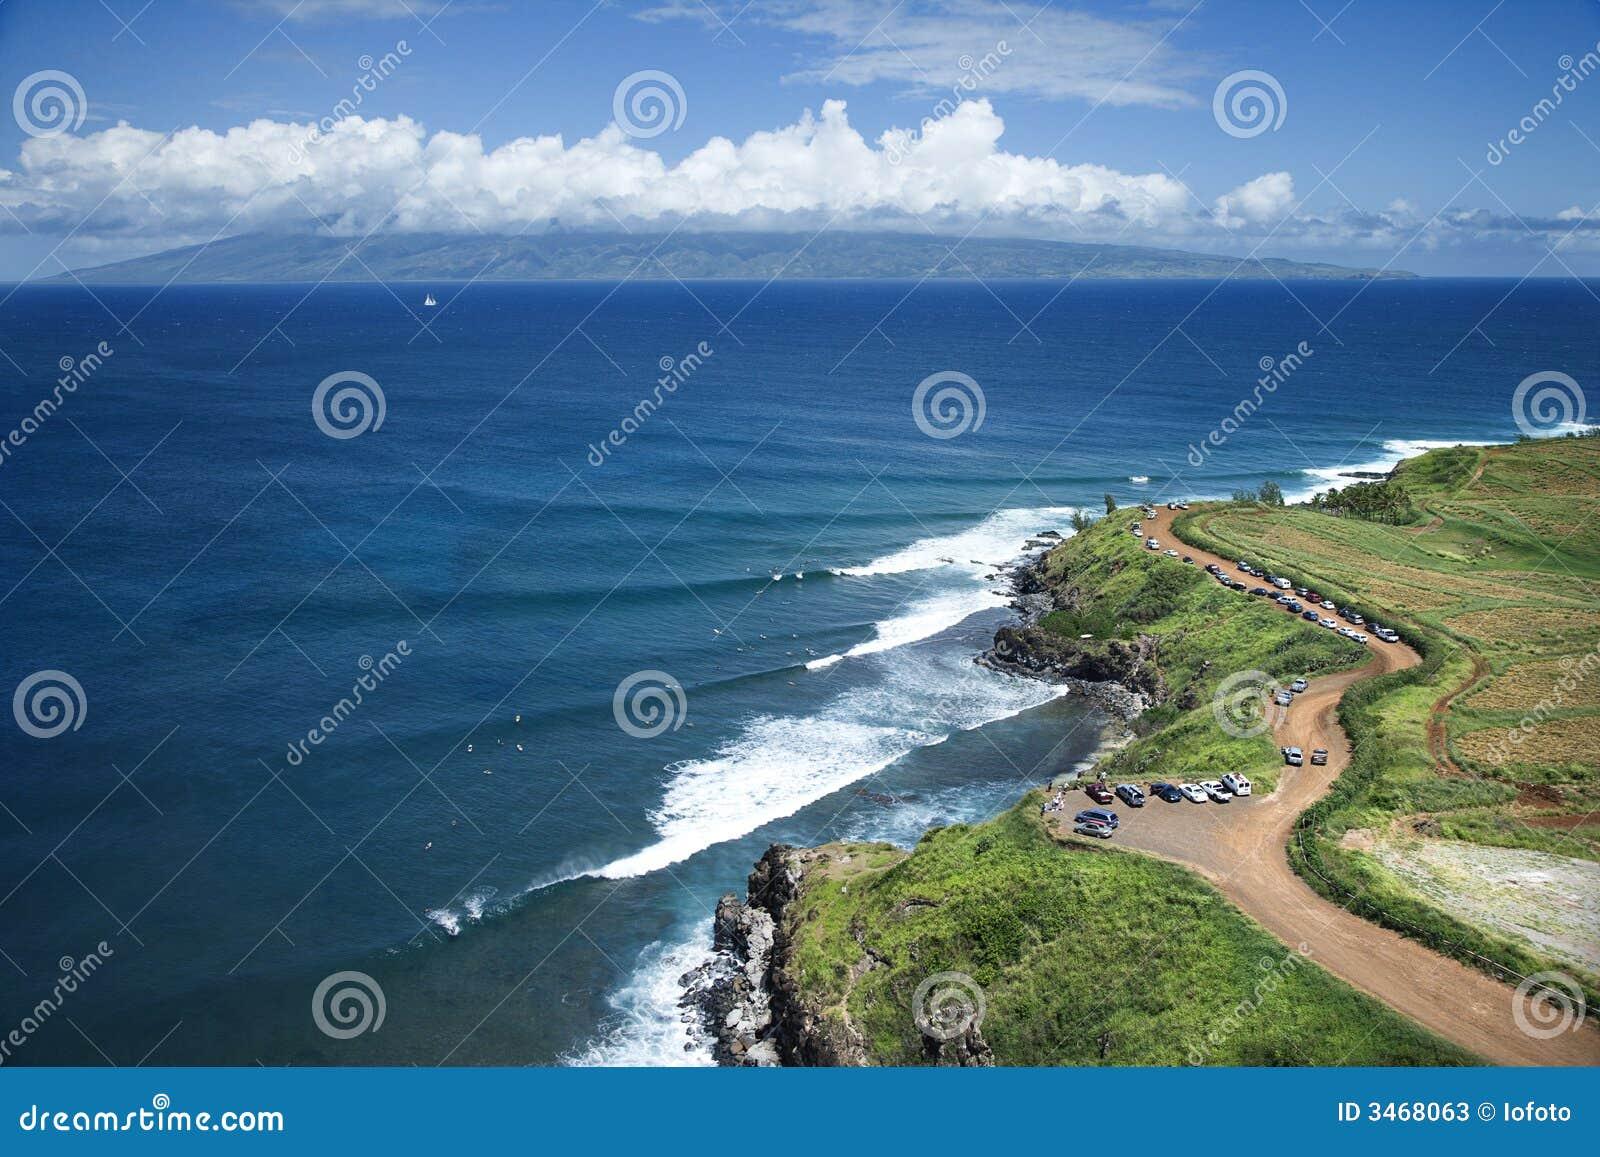 maui coastline stock photos image 3468063 20 minuten 24mx